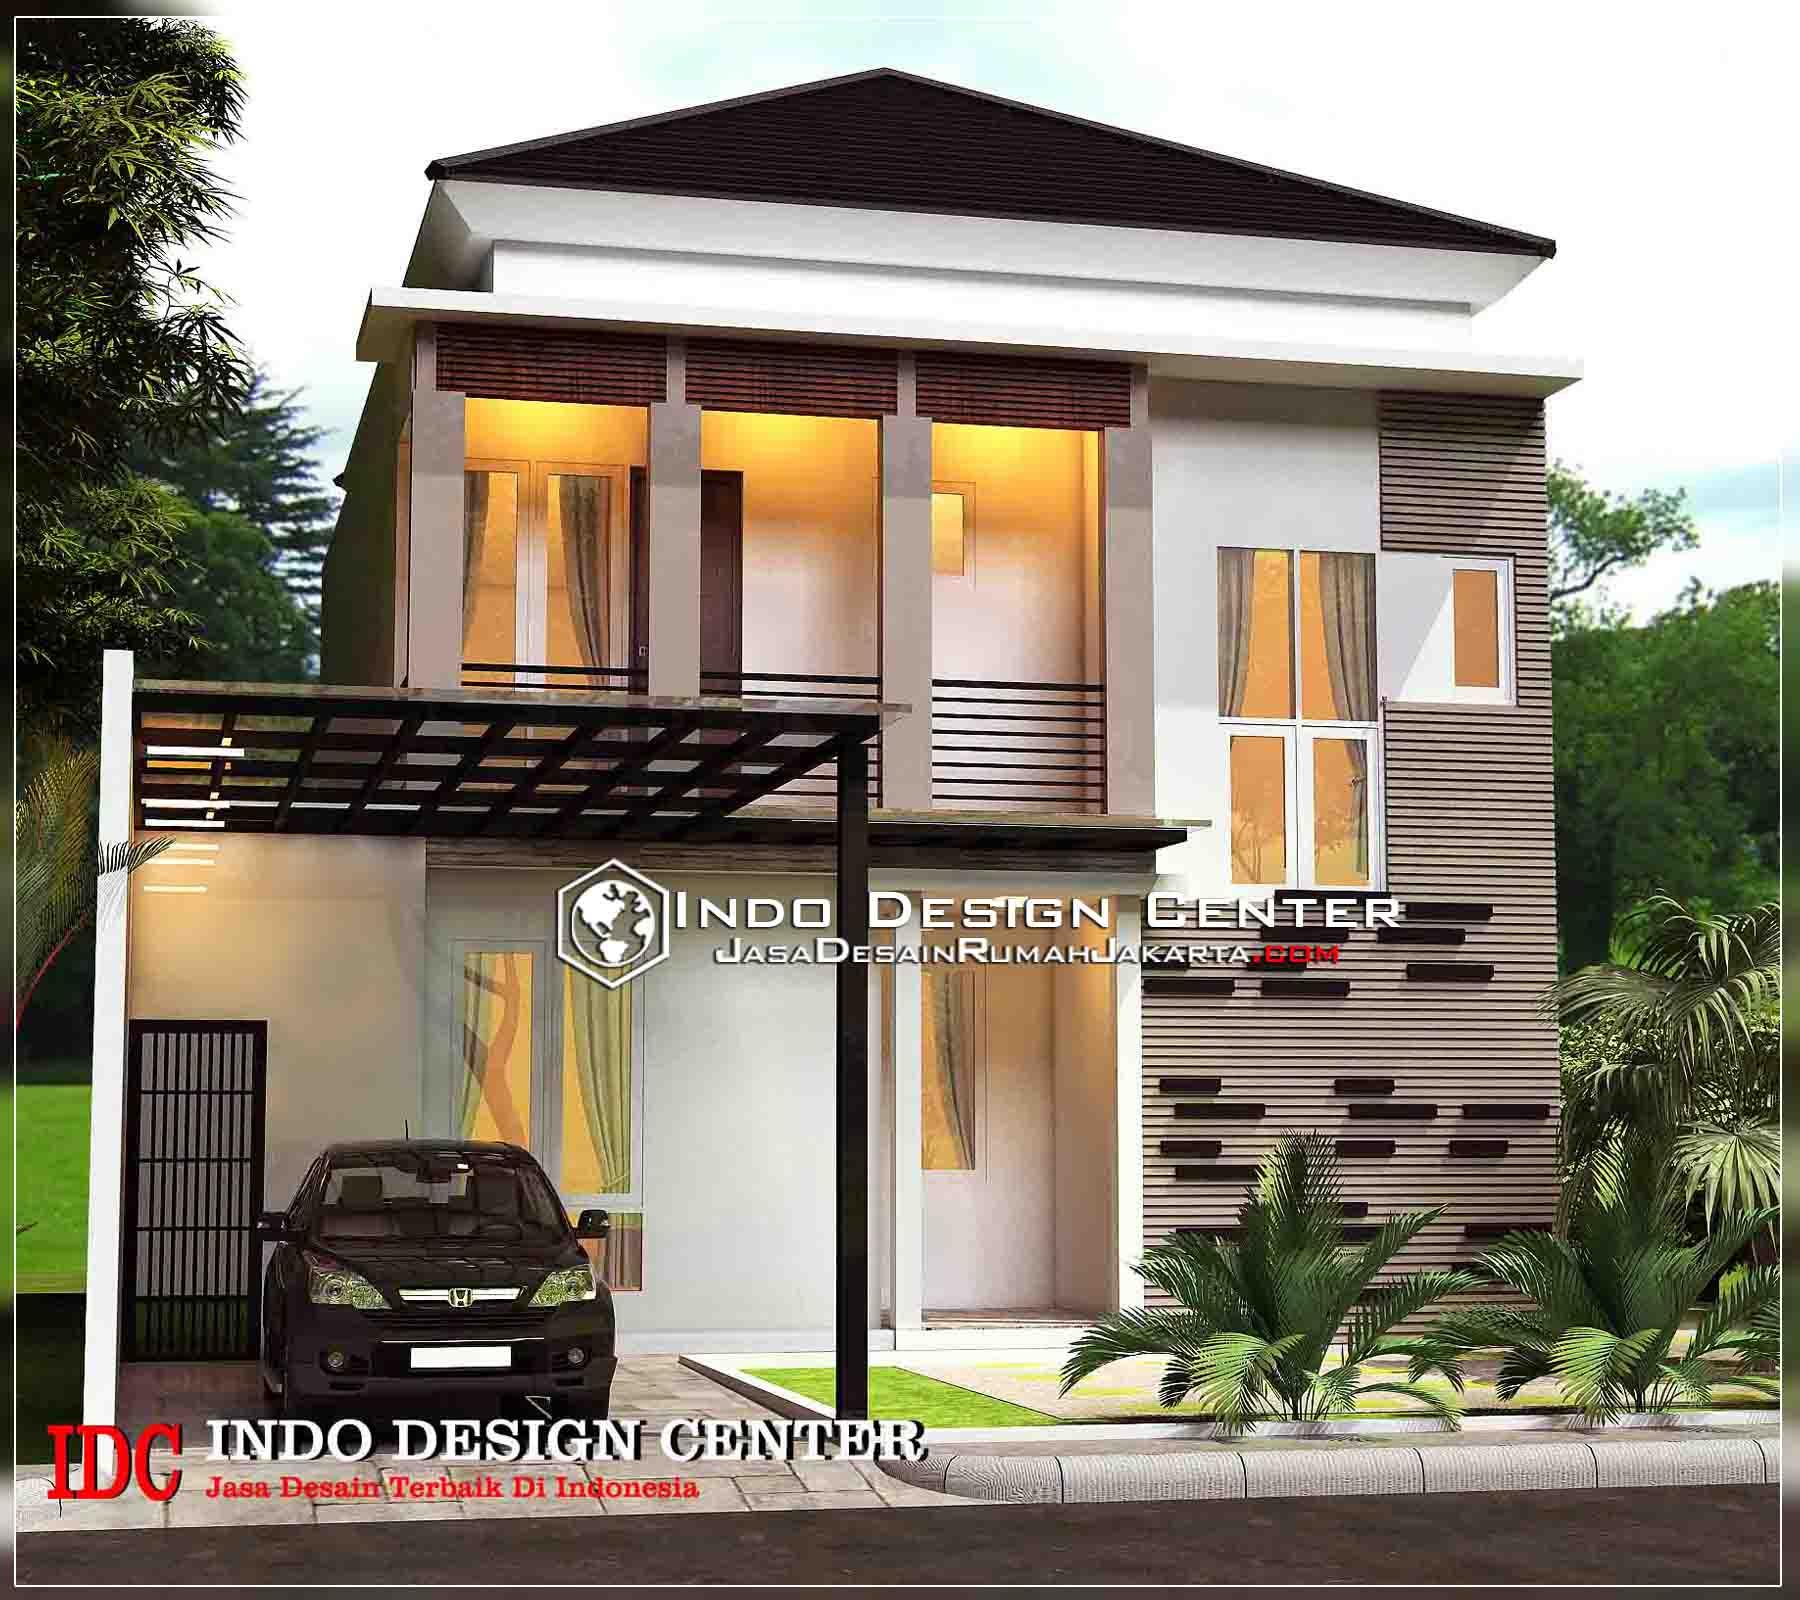 Rumah Minimalis Modern 2 Lantai Jasa Desain Rumah Jakarta